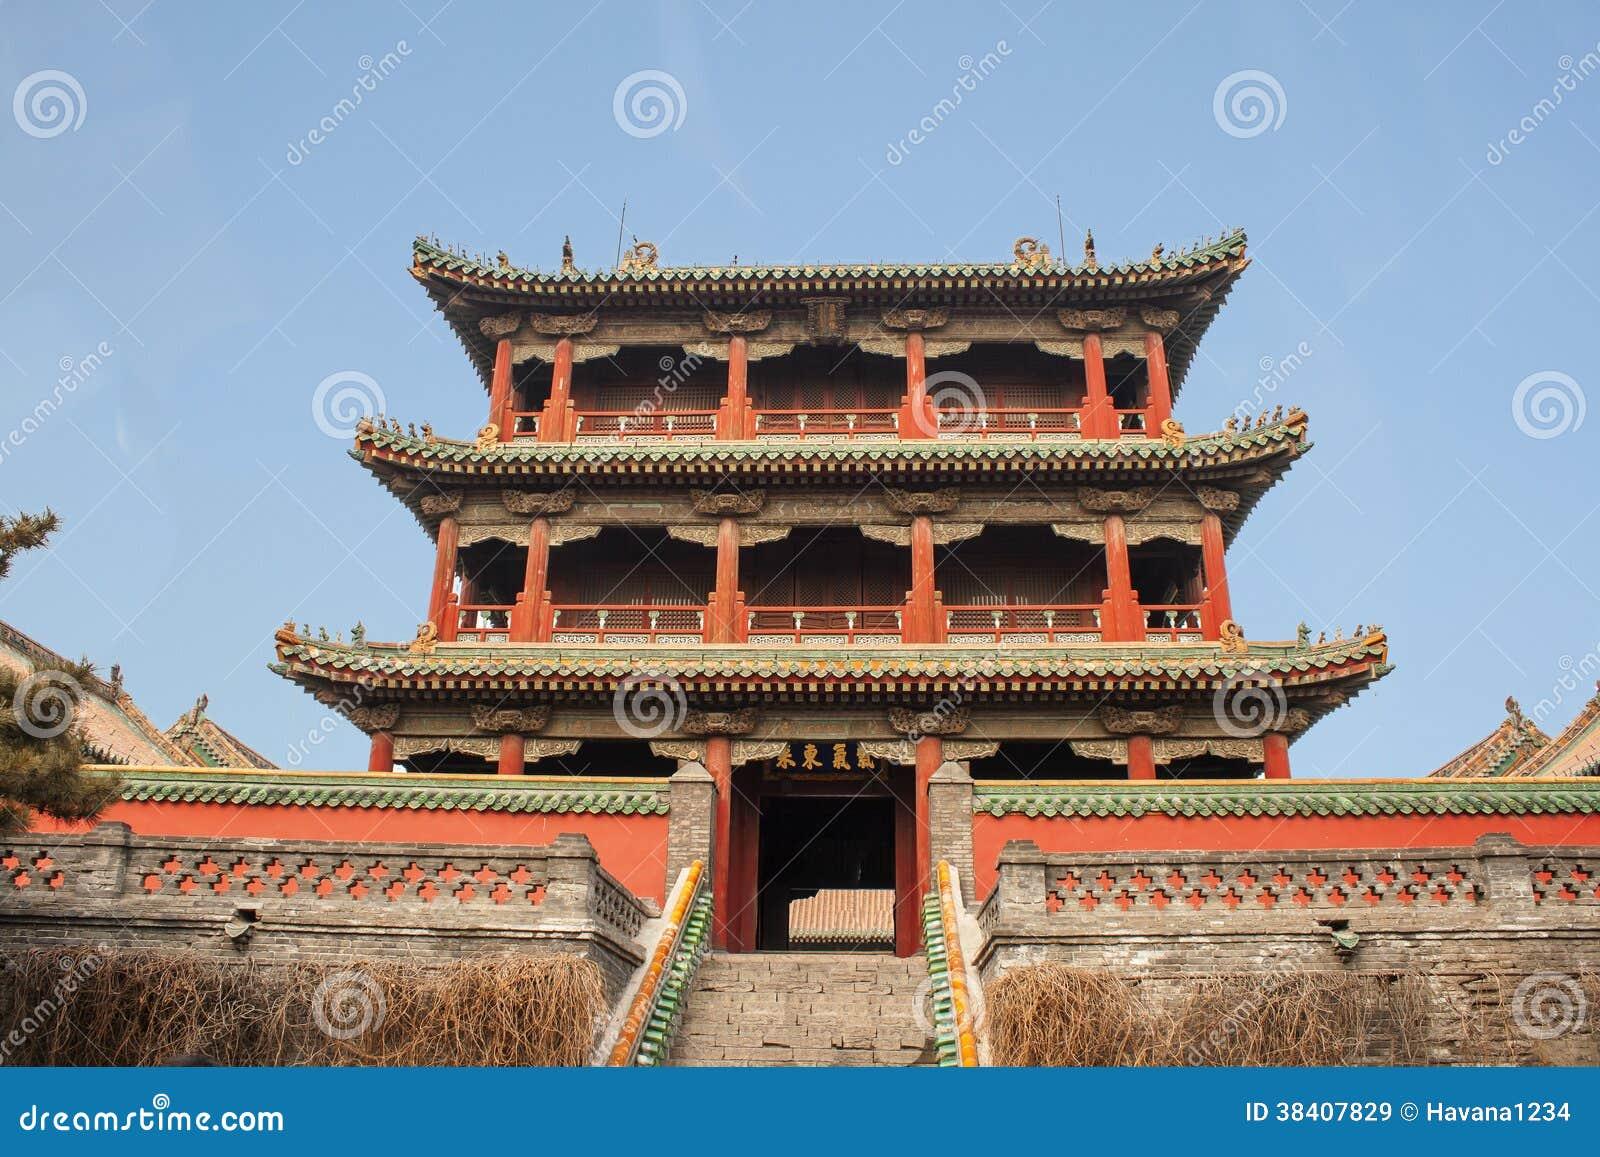 Imperial Palace Forbidden City Beijing China Stock Image ...  |Imperial Palace Forbidden City Beijing China